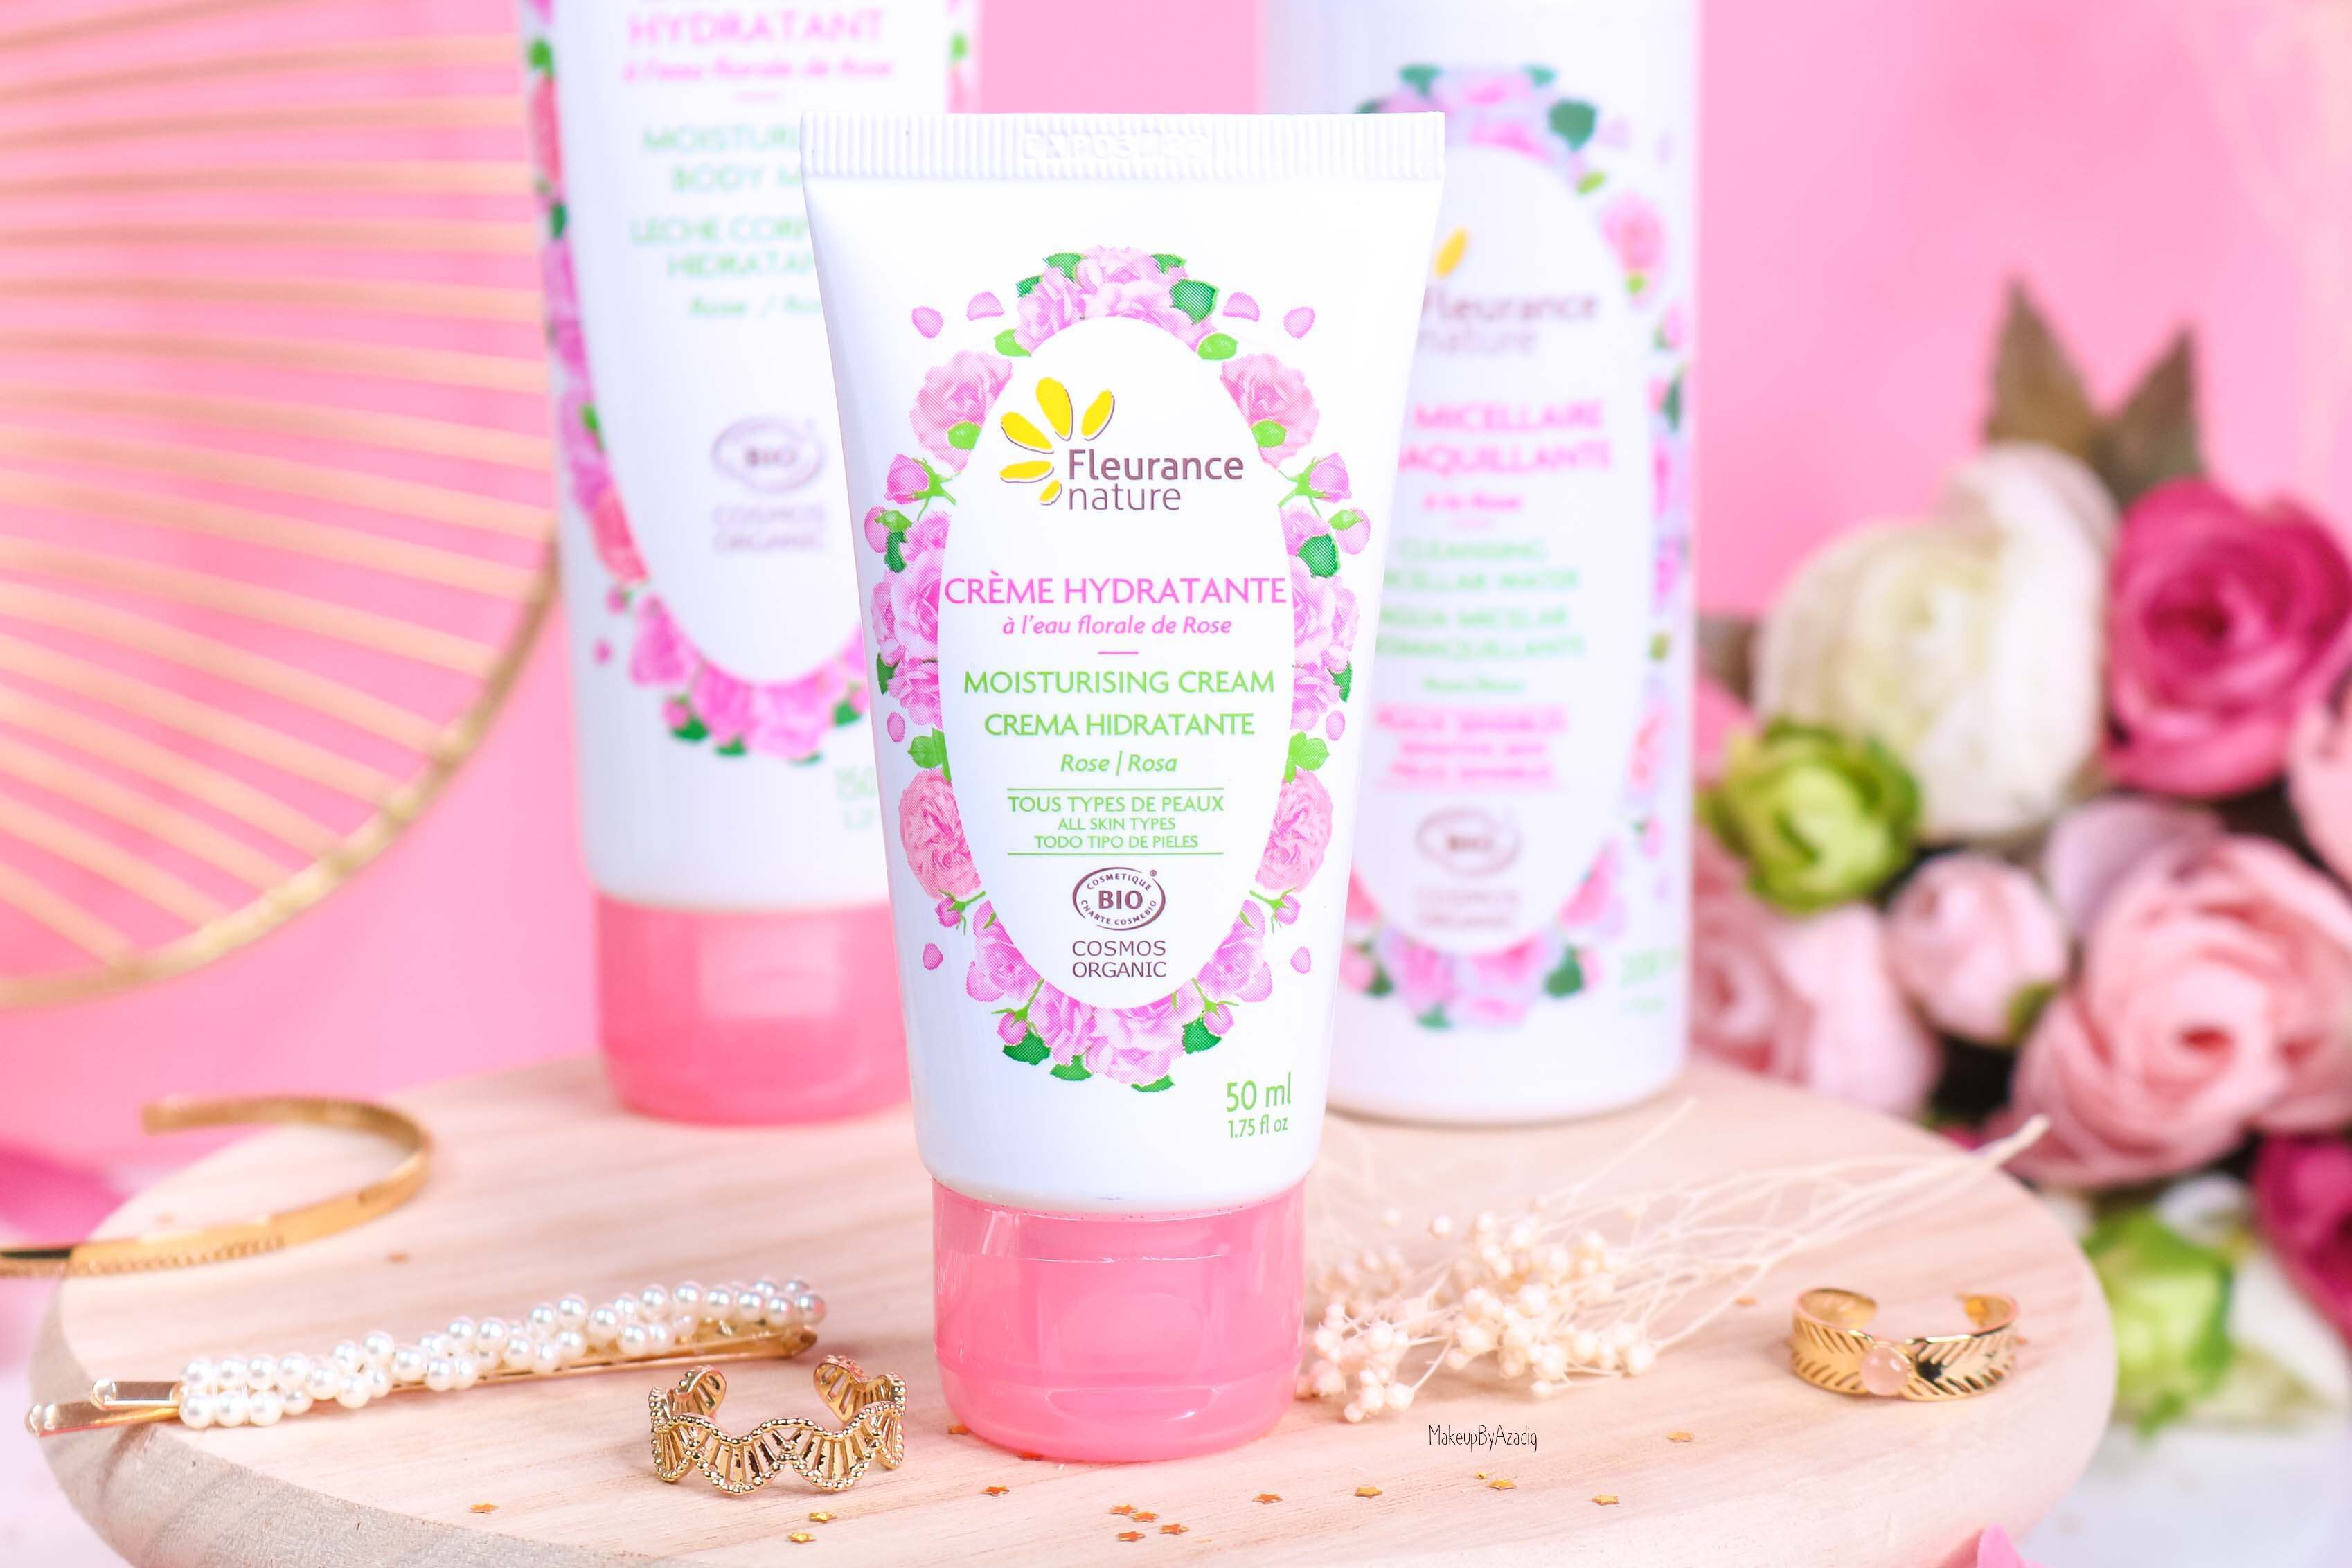 revue-produit-corps-visage-rose-fleurance-nature-hydratant-bio-cosmos-organic-avis-prix-makeupbyazadig-eau-micellaire-creme